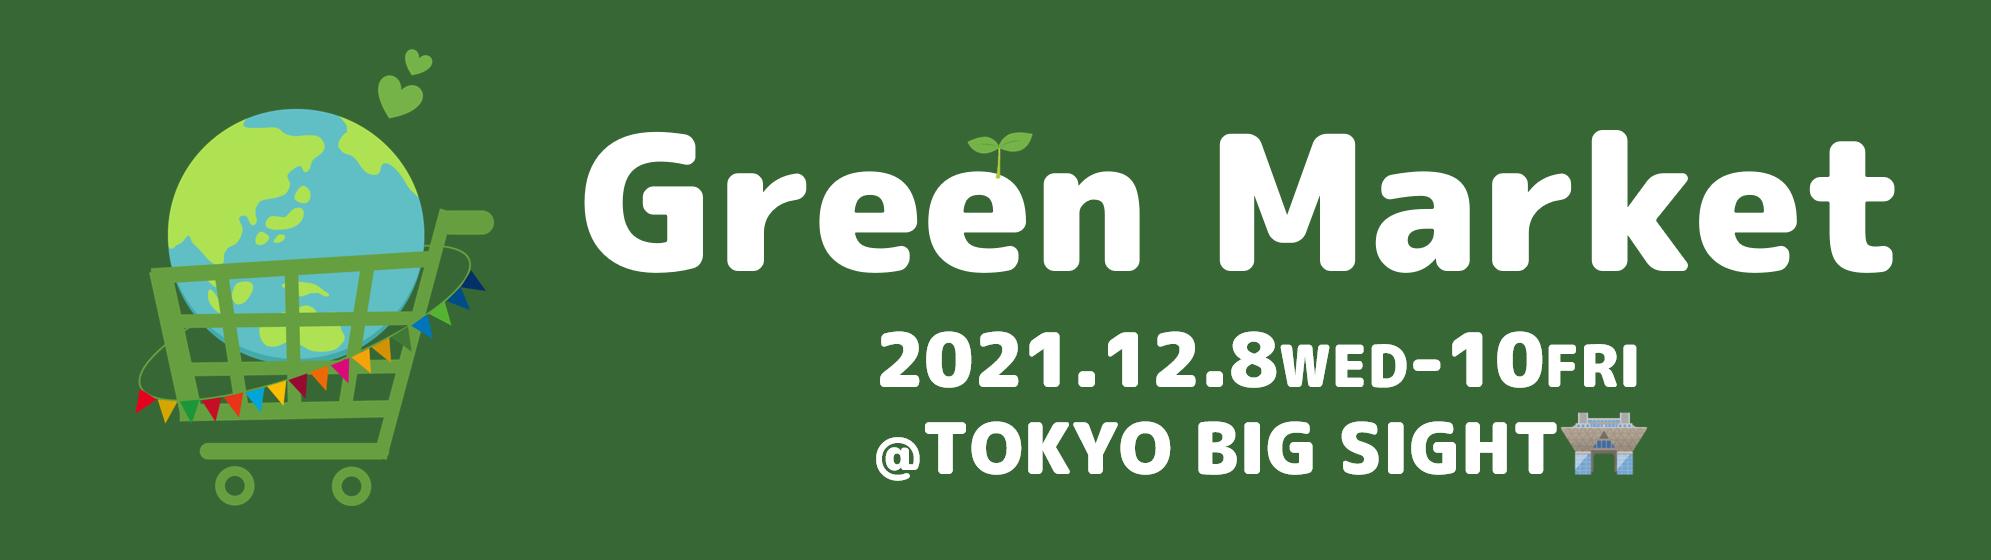 GM21_WEB_募集ページ_バナー2